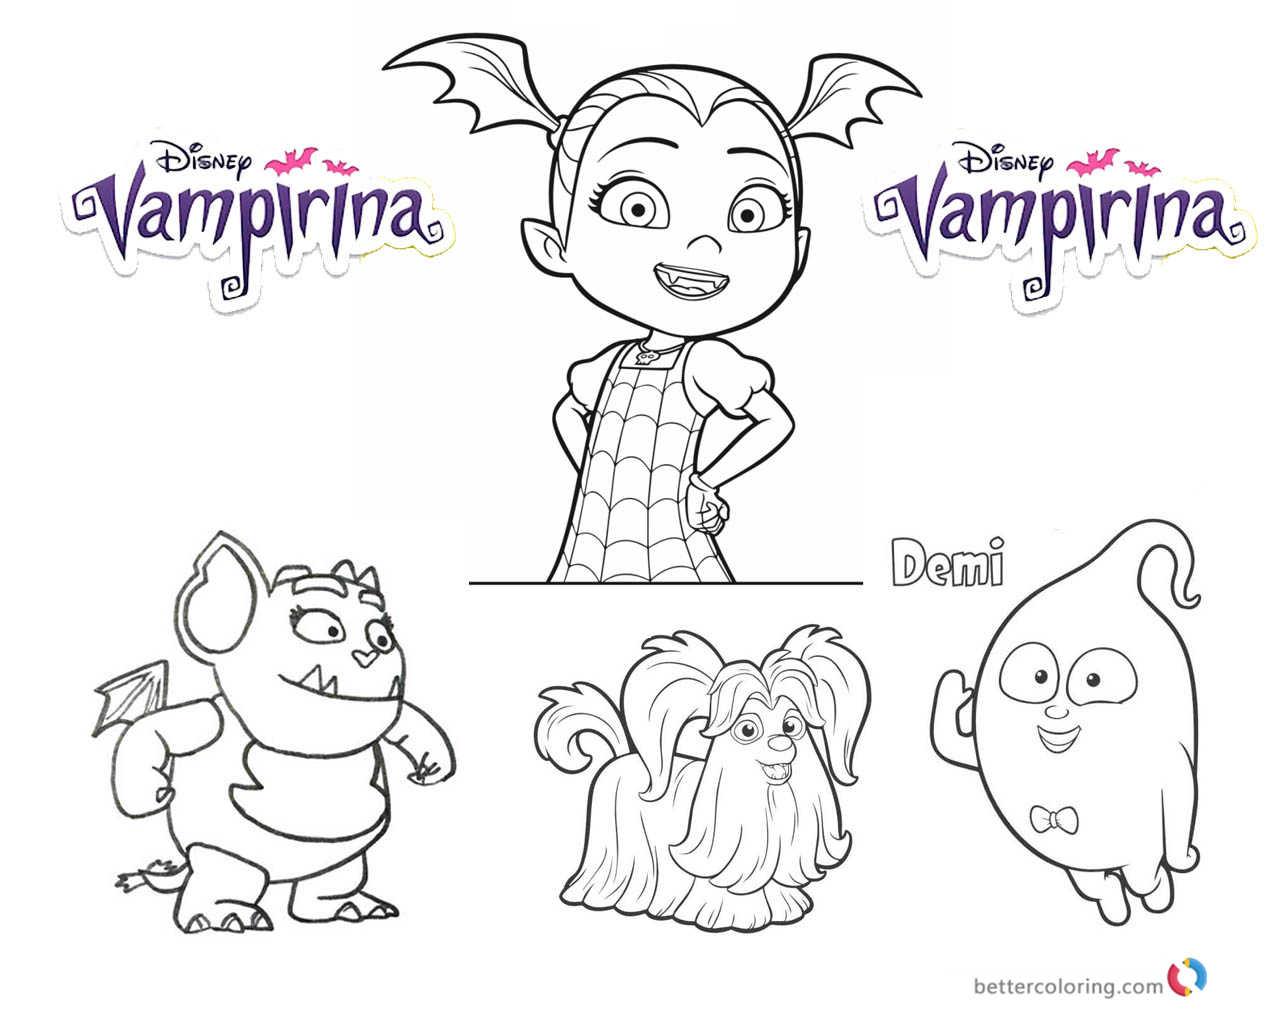 Vampirina coloring pages Vampirina